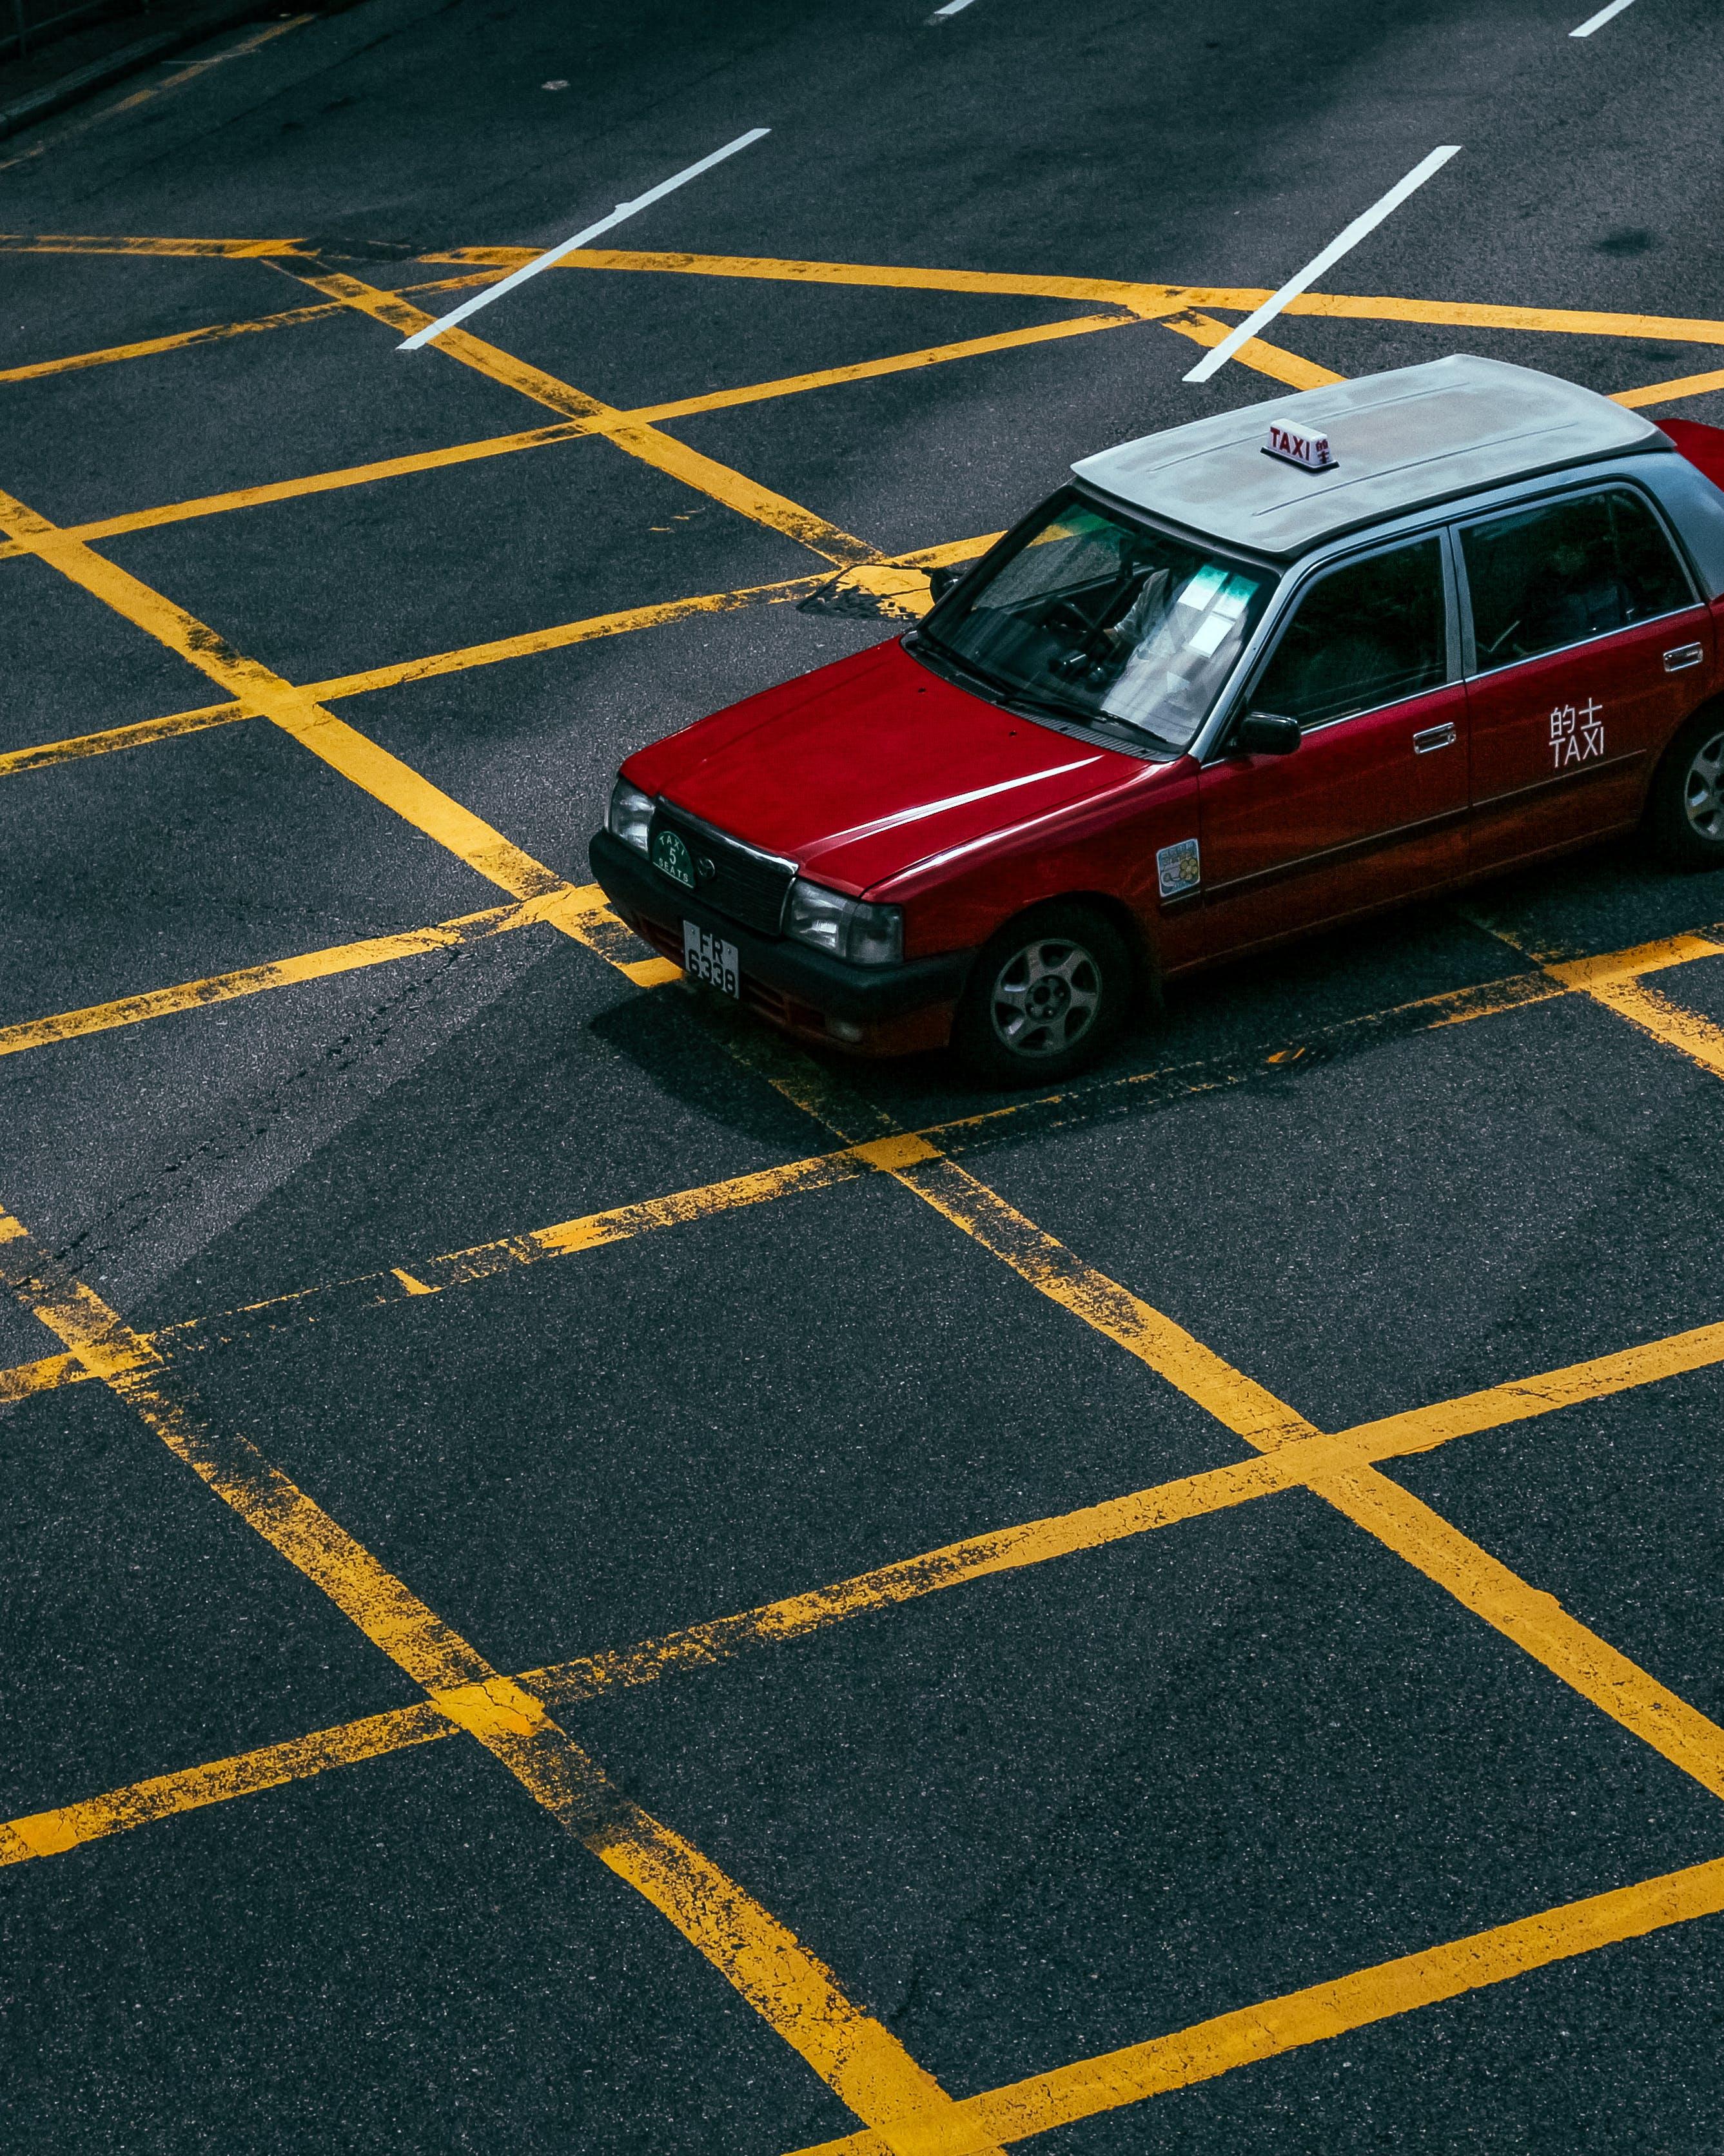 Free stock photo of taxi, urban